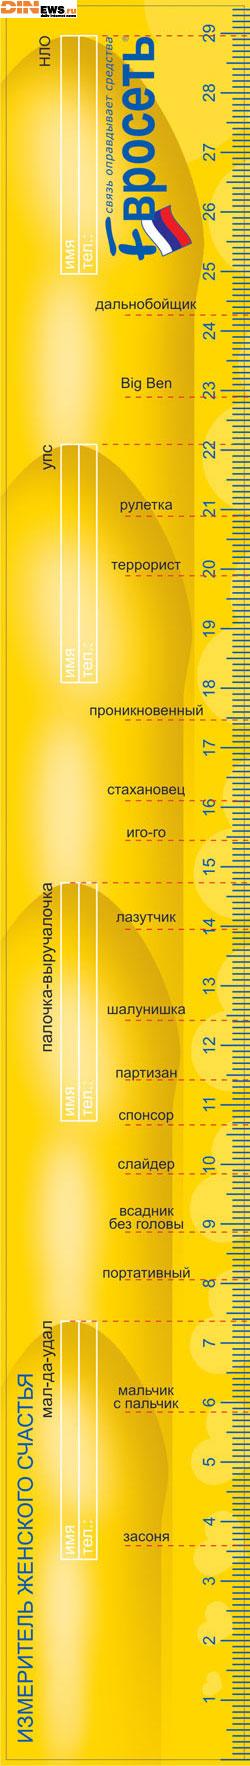 http://www.dinews.ru/newspics/euroset_lineyka.jpg